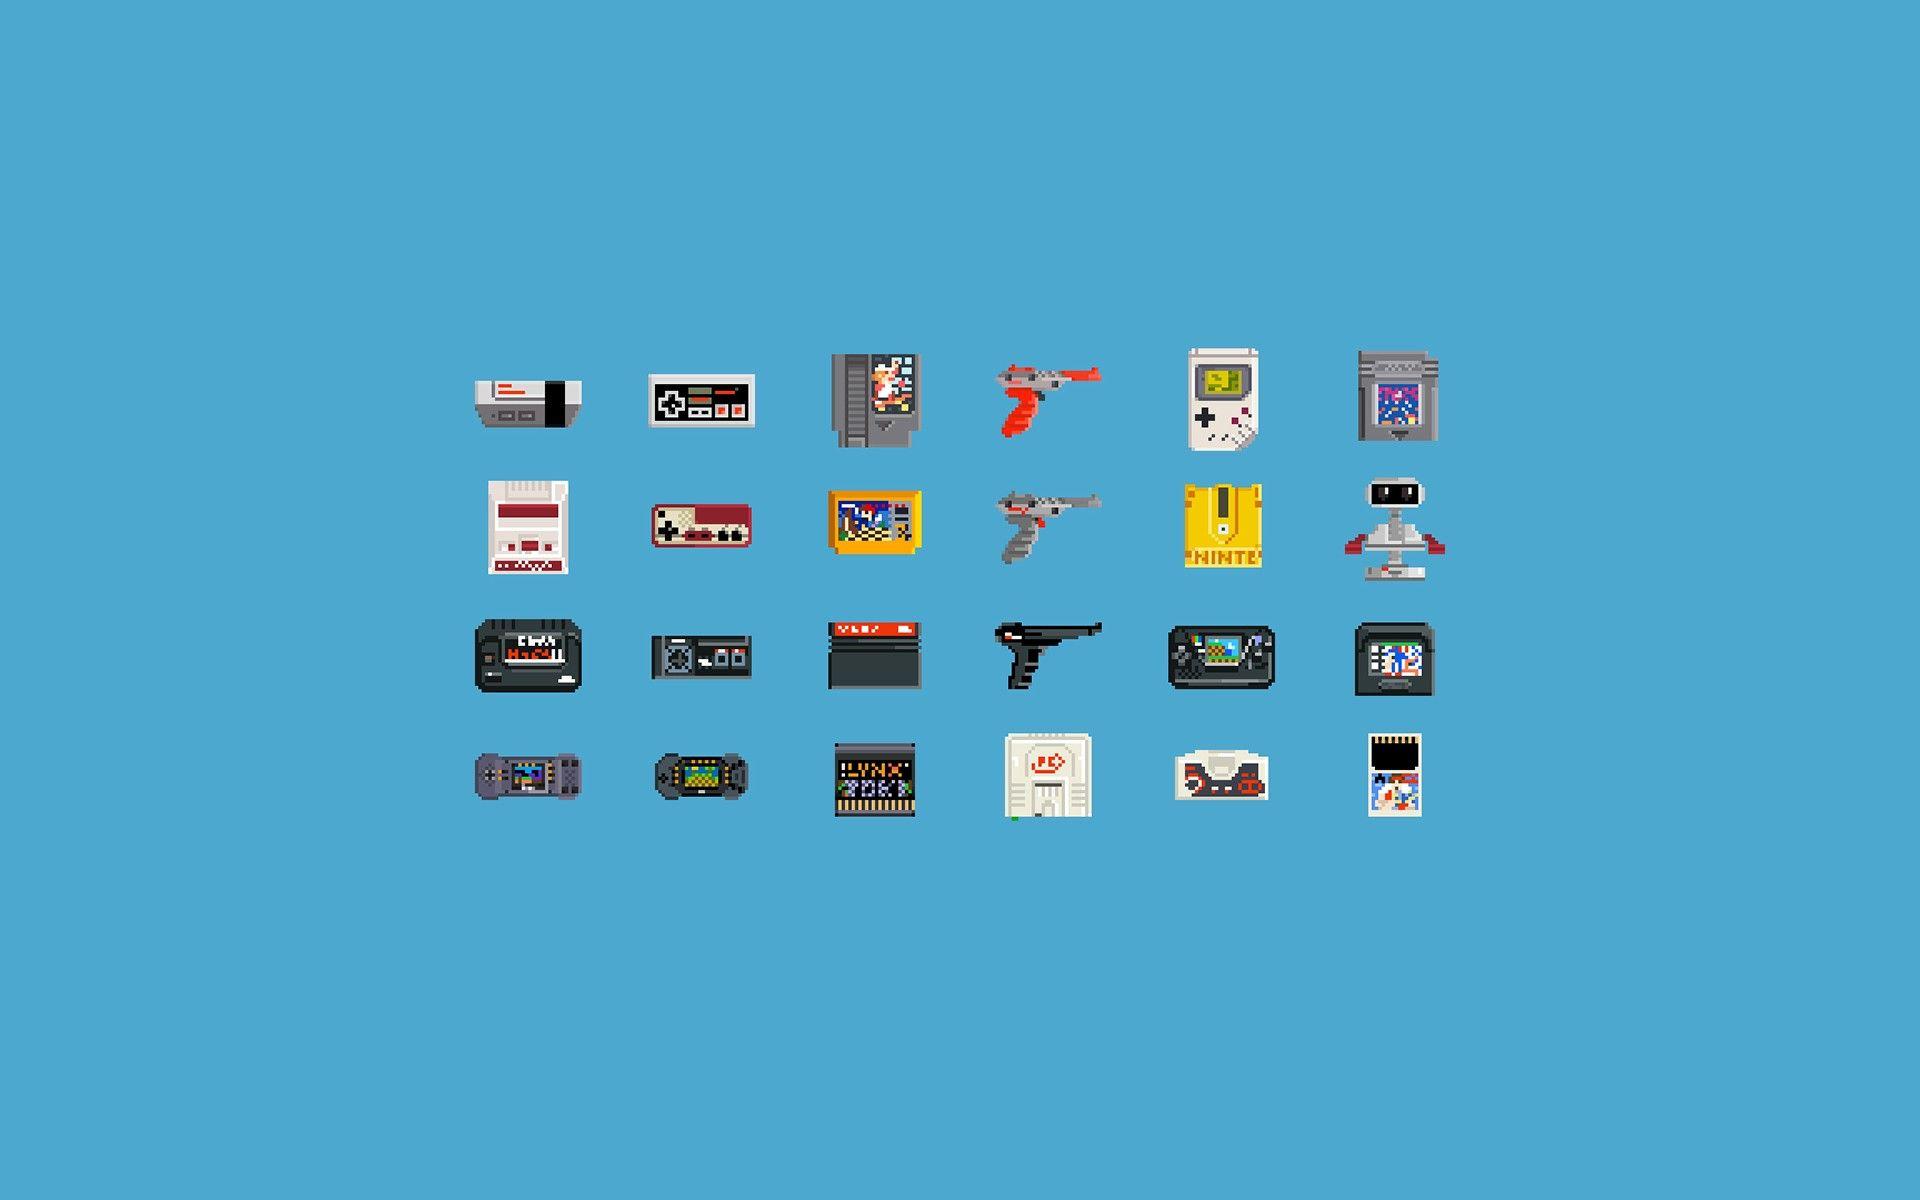 General 1920x1200 Video Games Consoles Pixel Art 8 Bit Nintendo